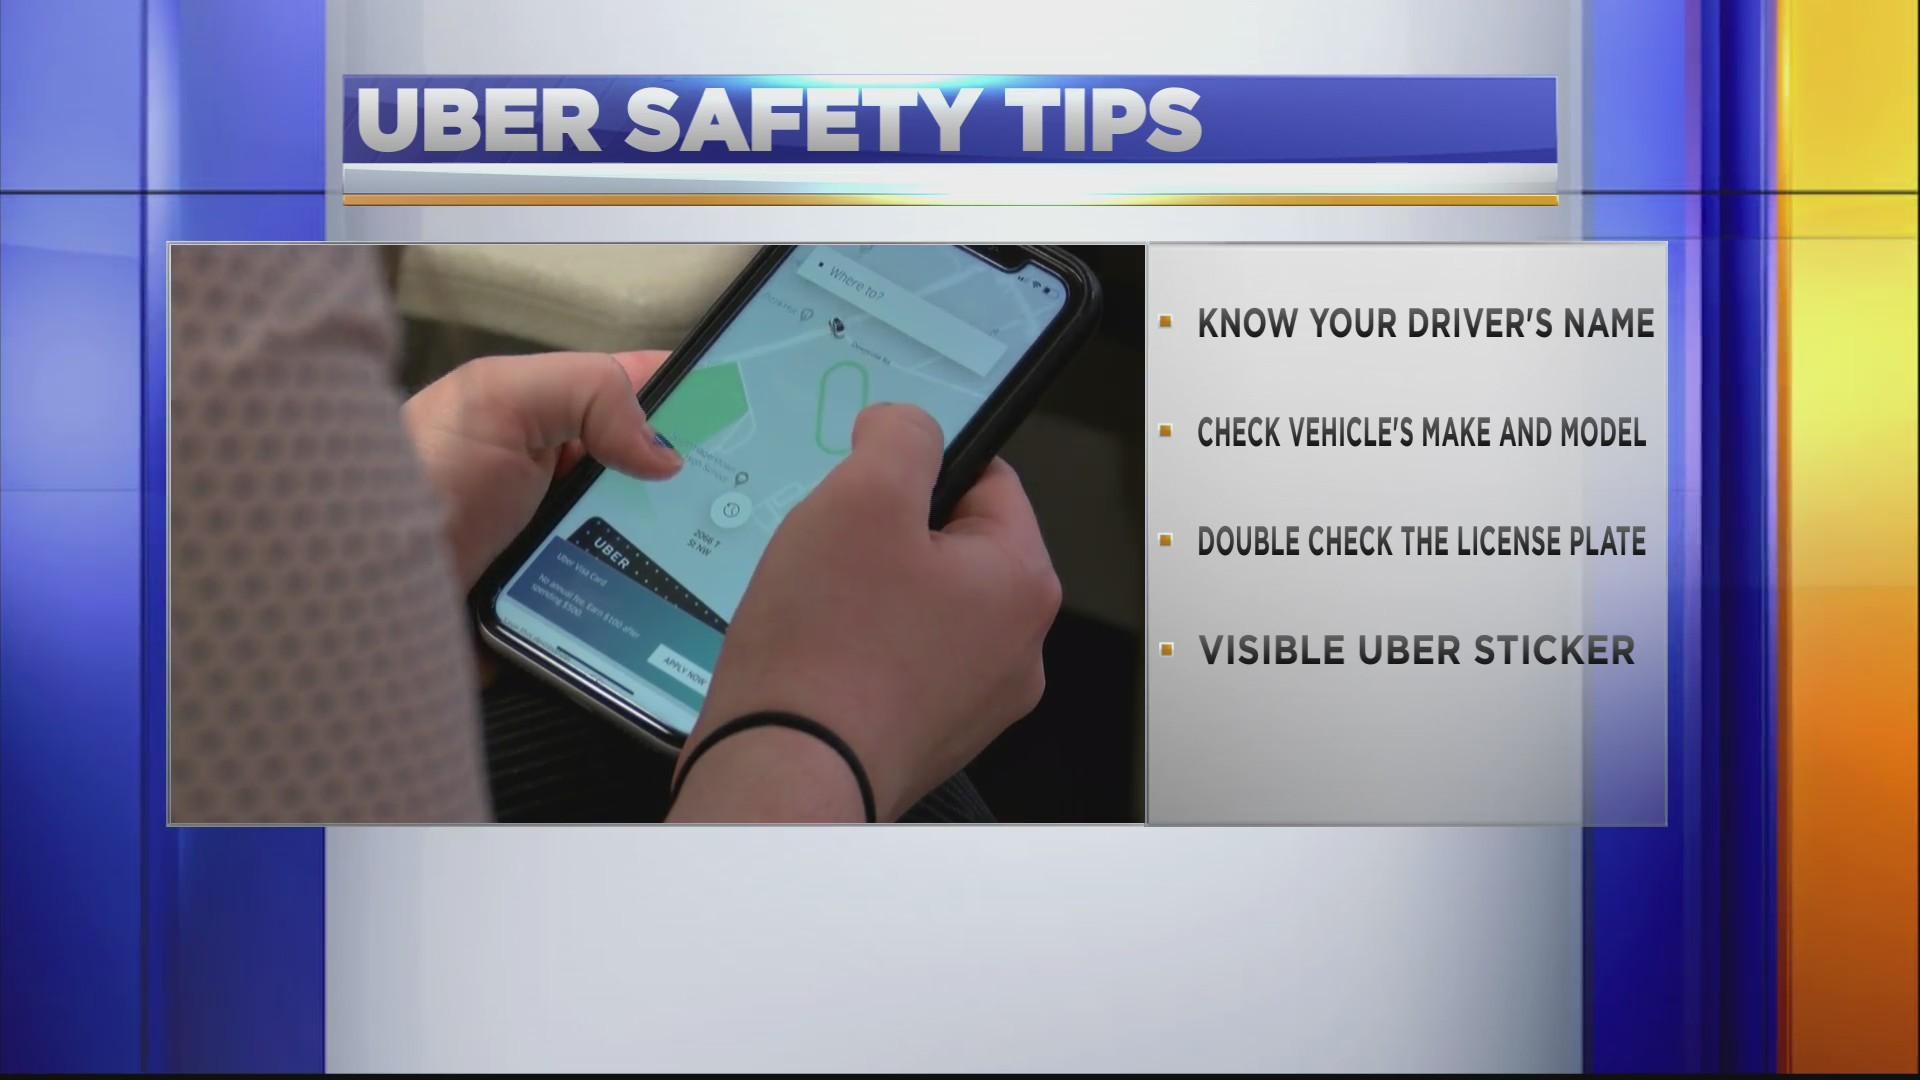 Uber_Safety_9_20190402020905